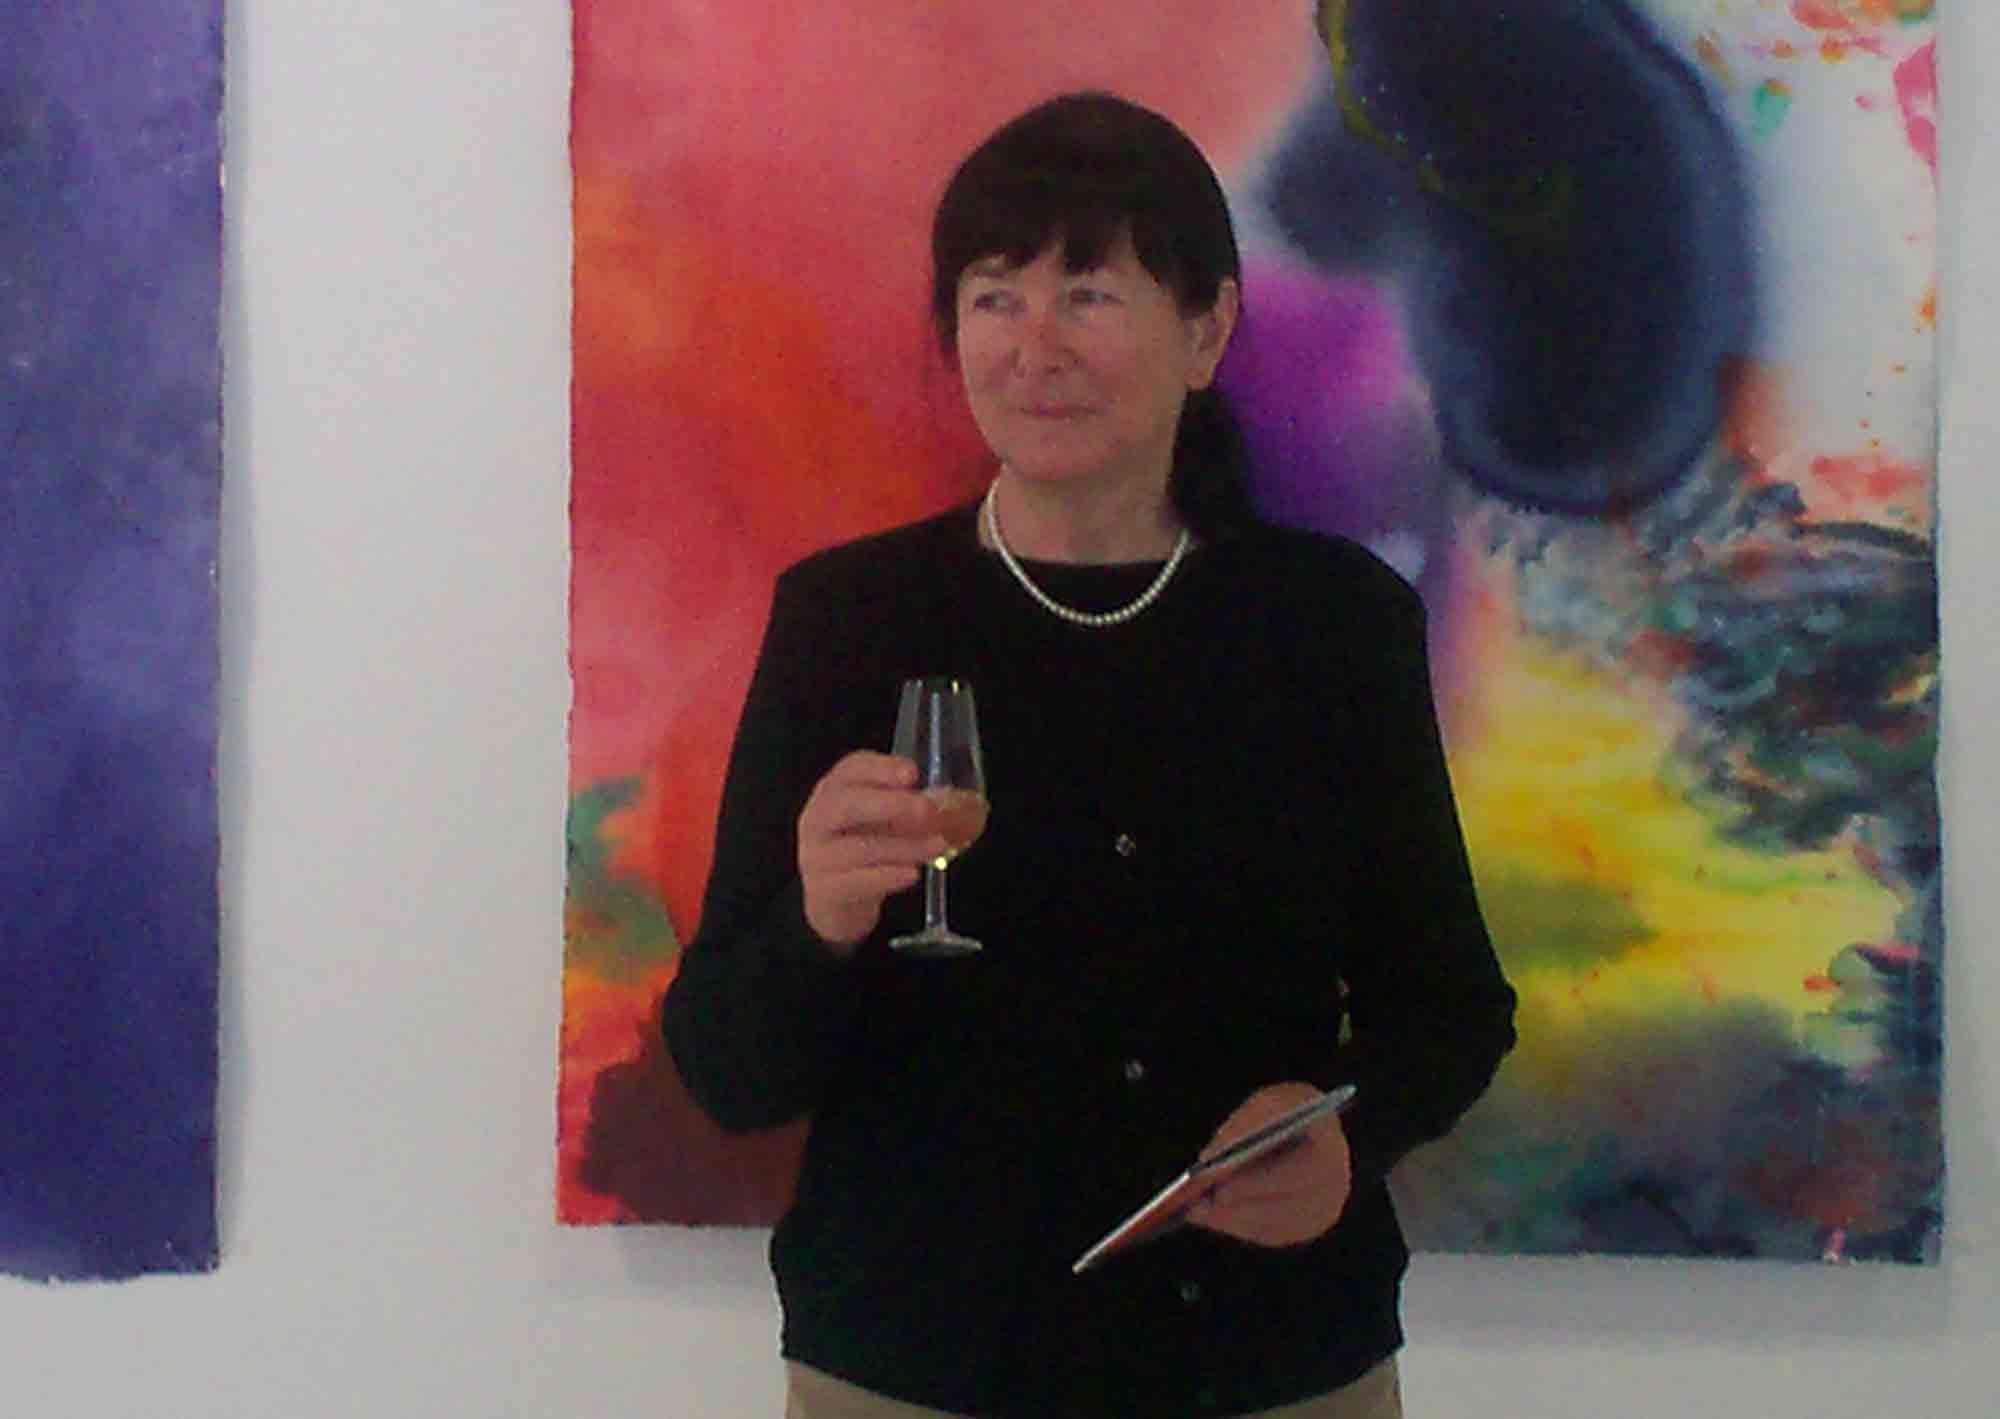 Ursula Wentzlaff